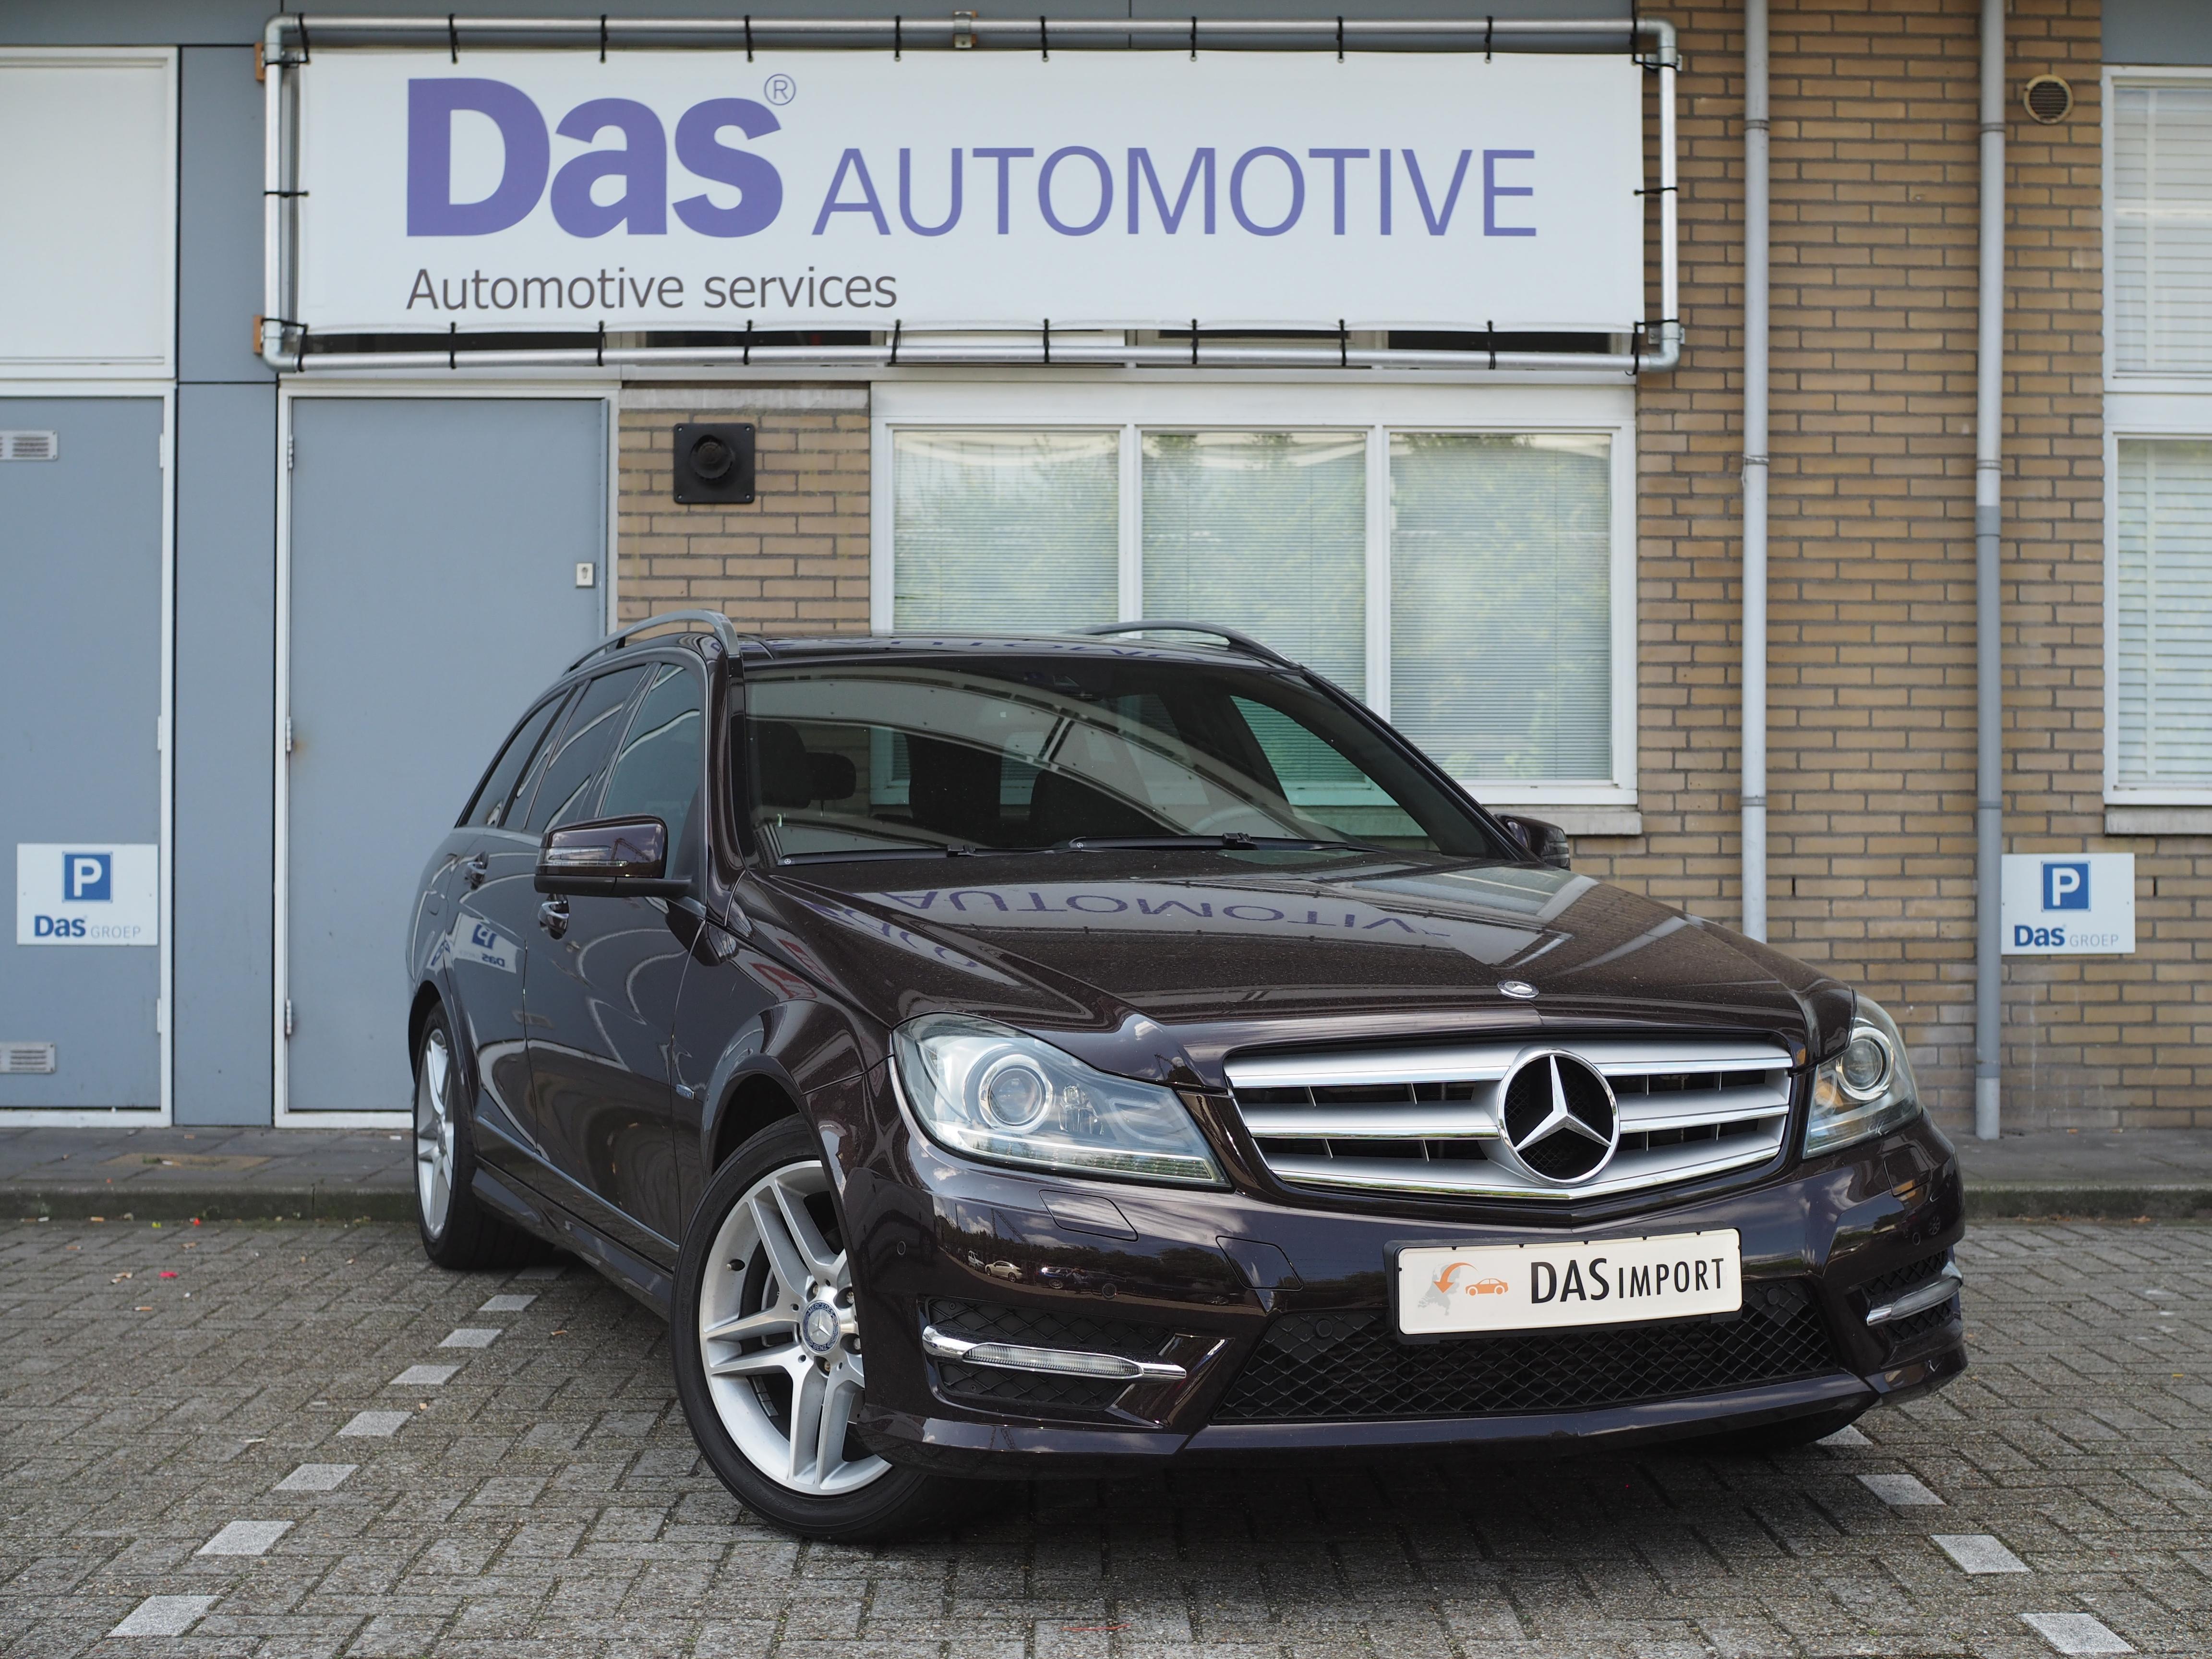 Importauto: Mercedes-Benz C 250 Estate Avantgarde 5/2011